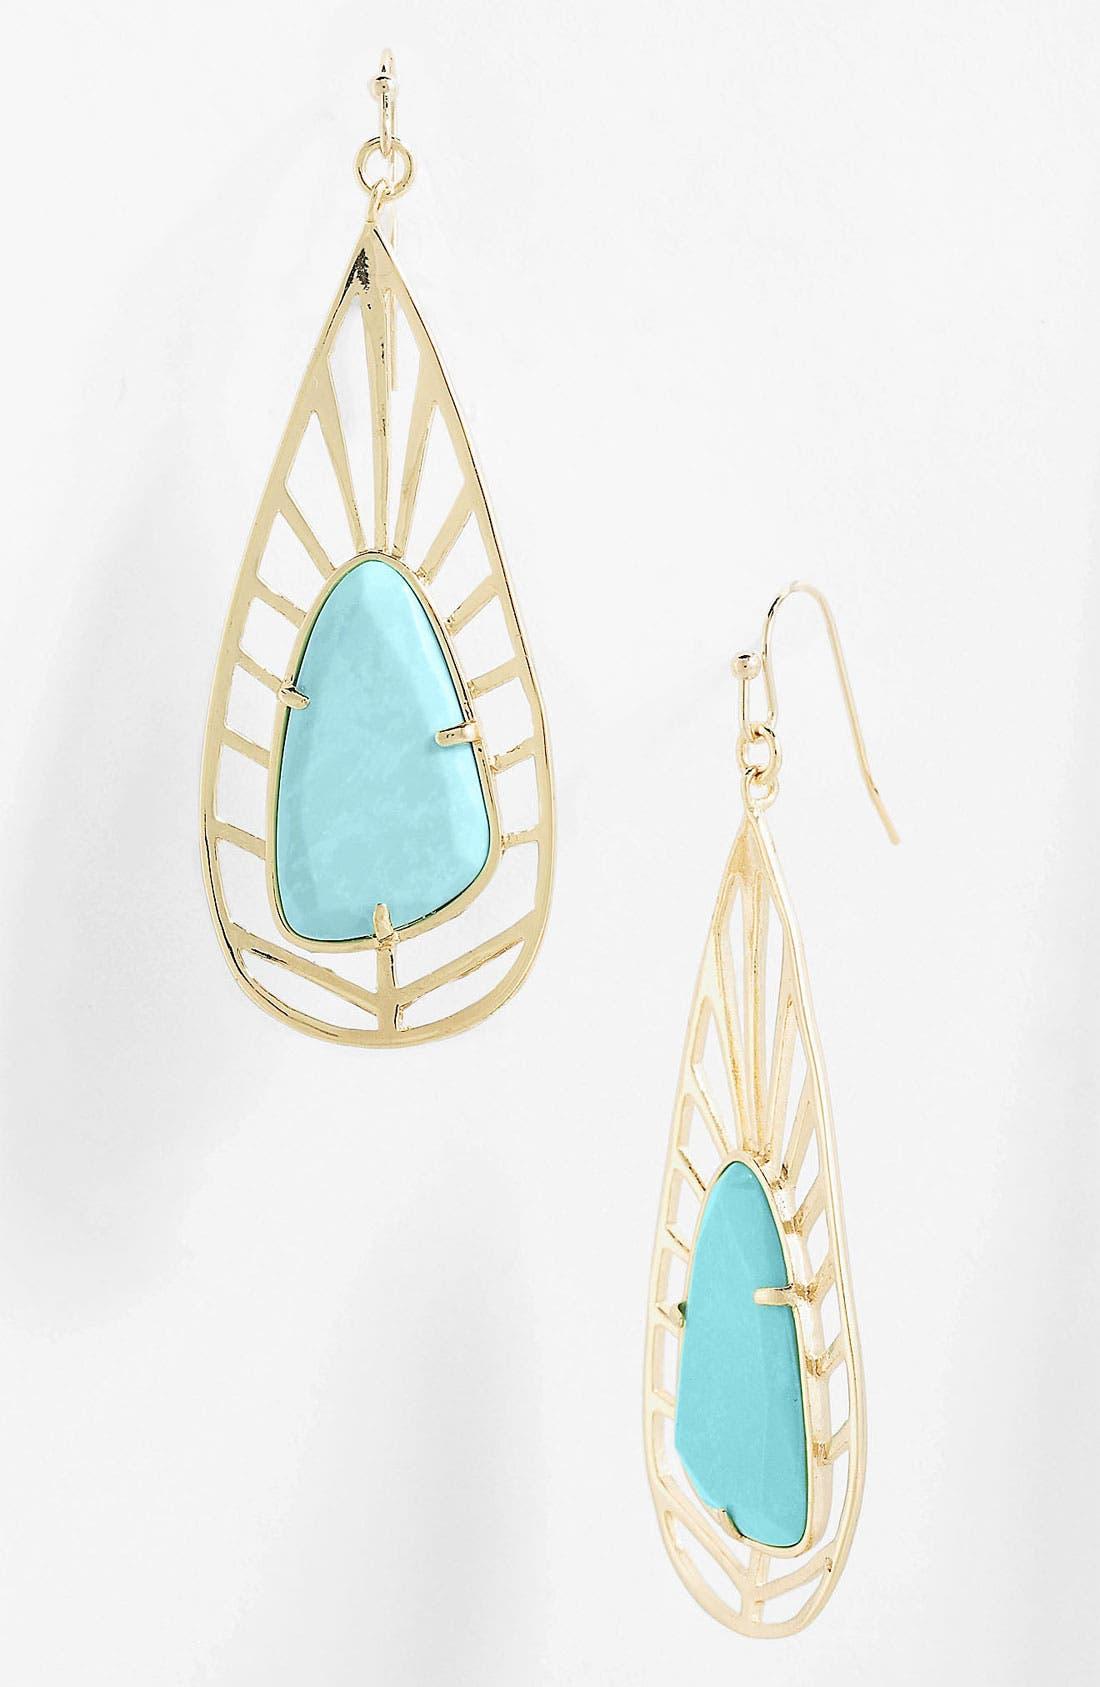 Main Image - Kendra Scott 'Lyra' Teardrop Earrings